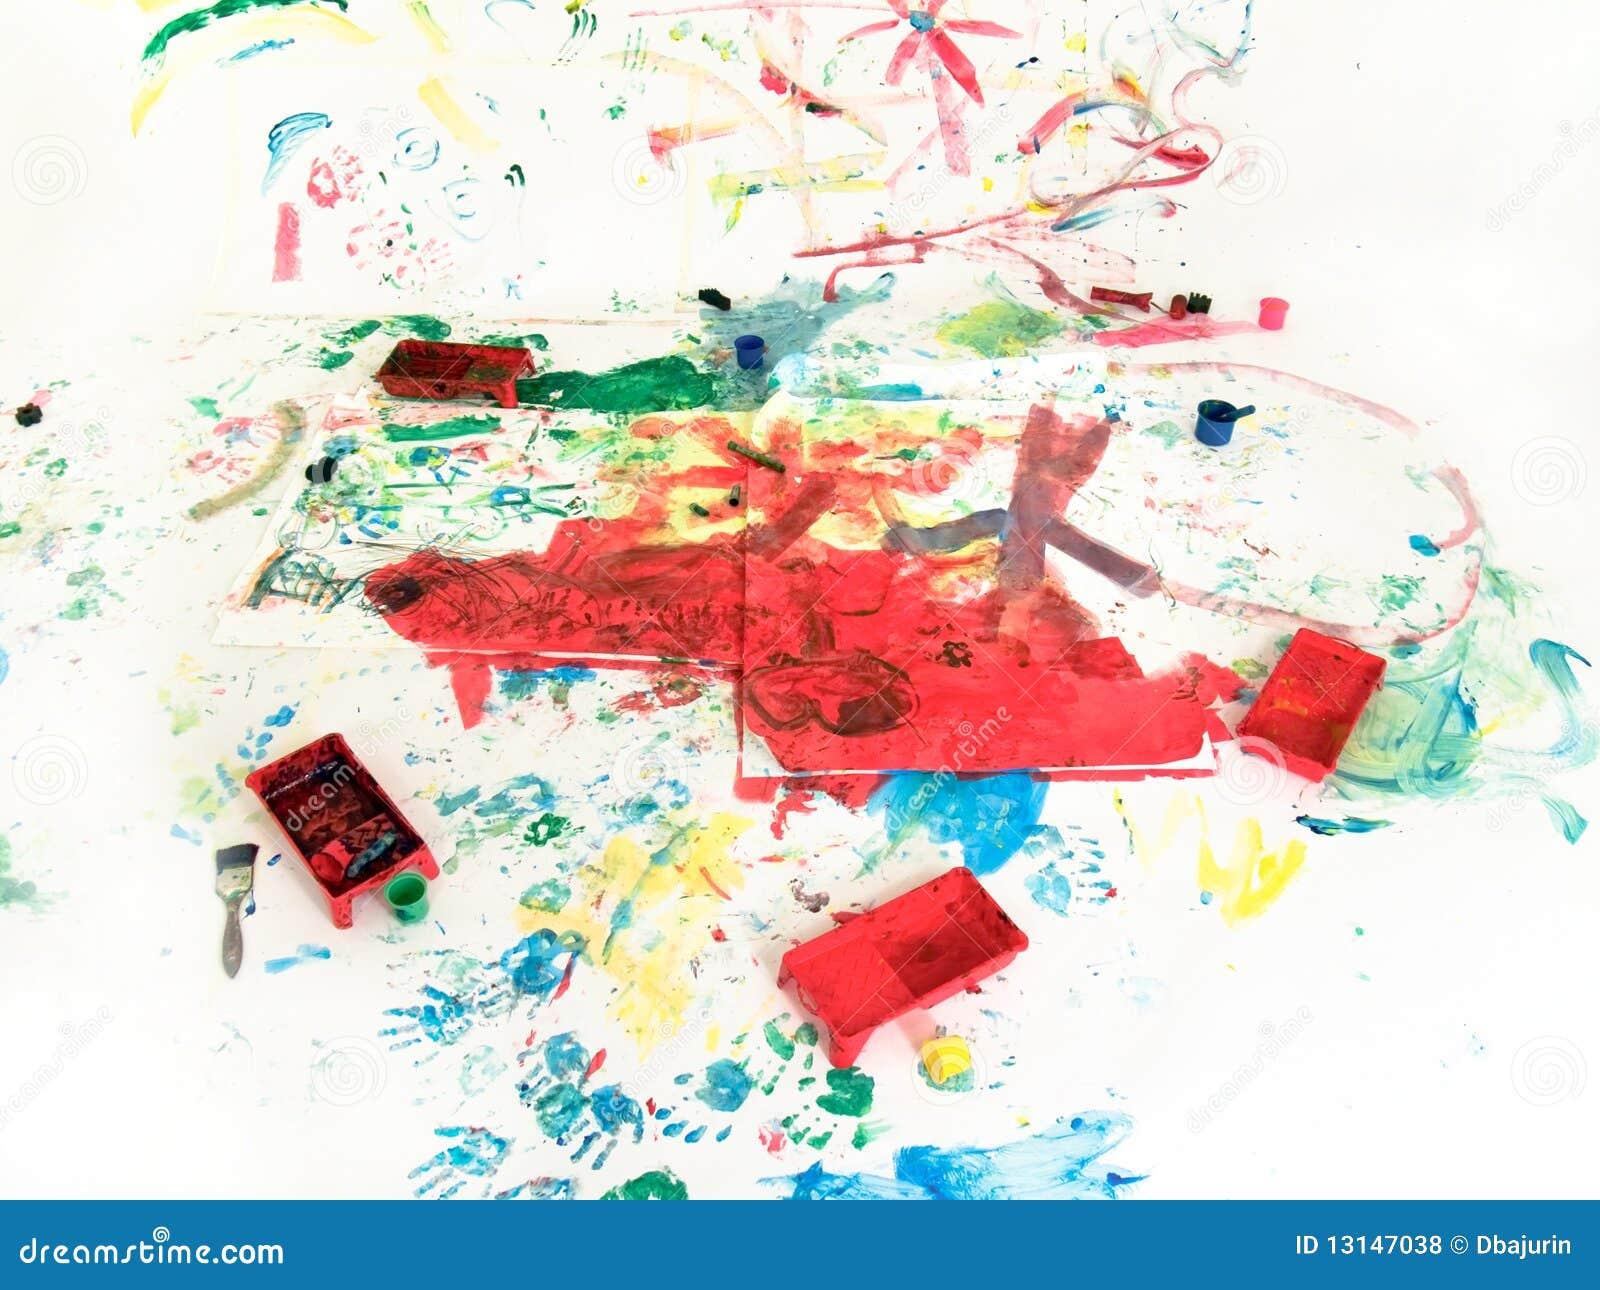 Peinture boiro jeu deffet - Jeu de peinture en ligne ...